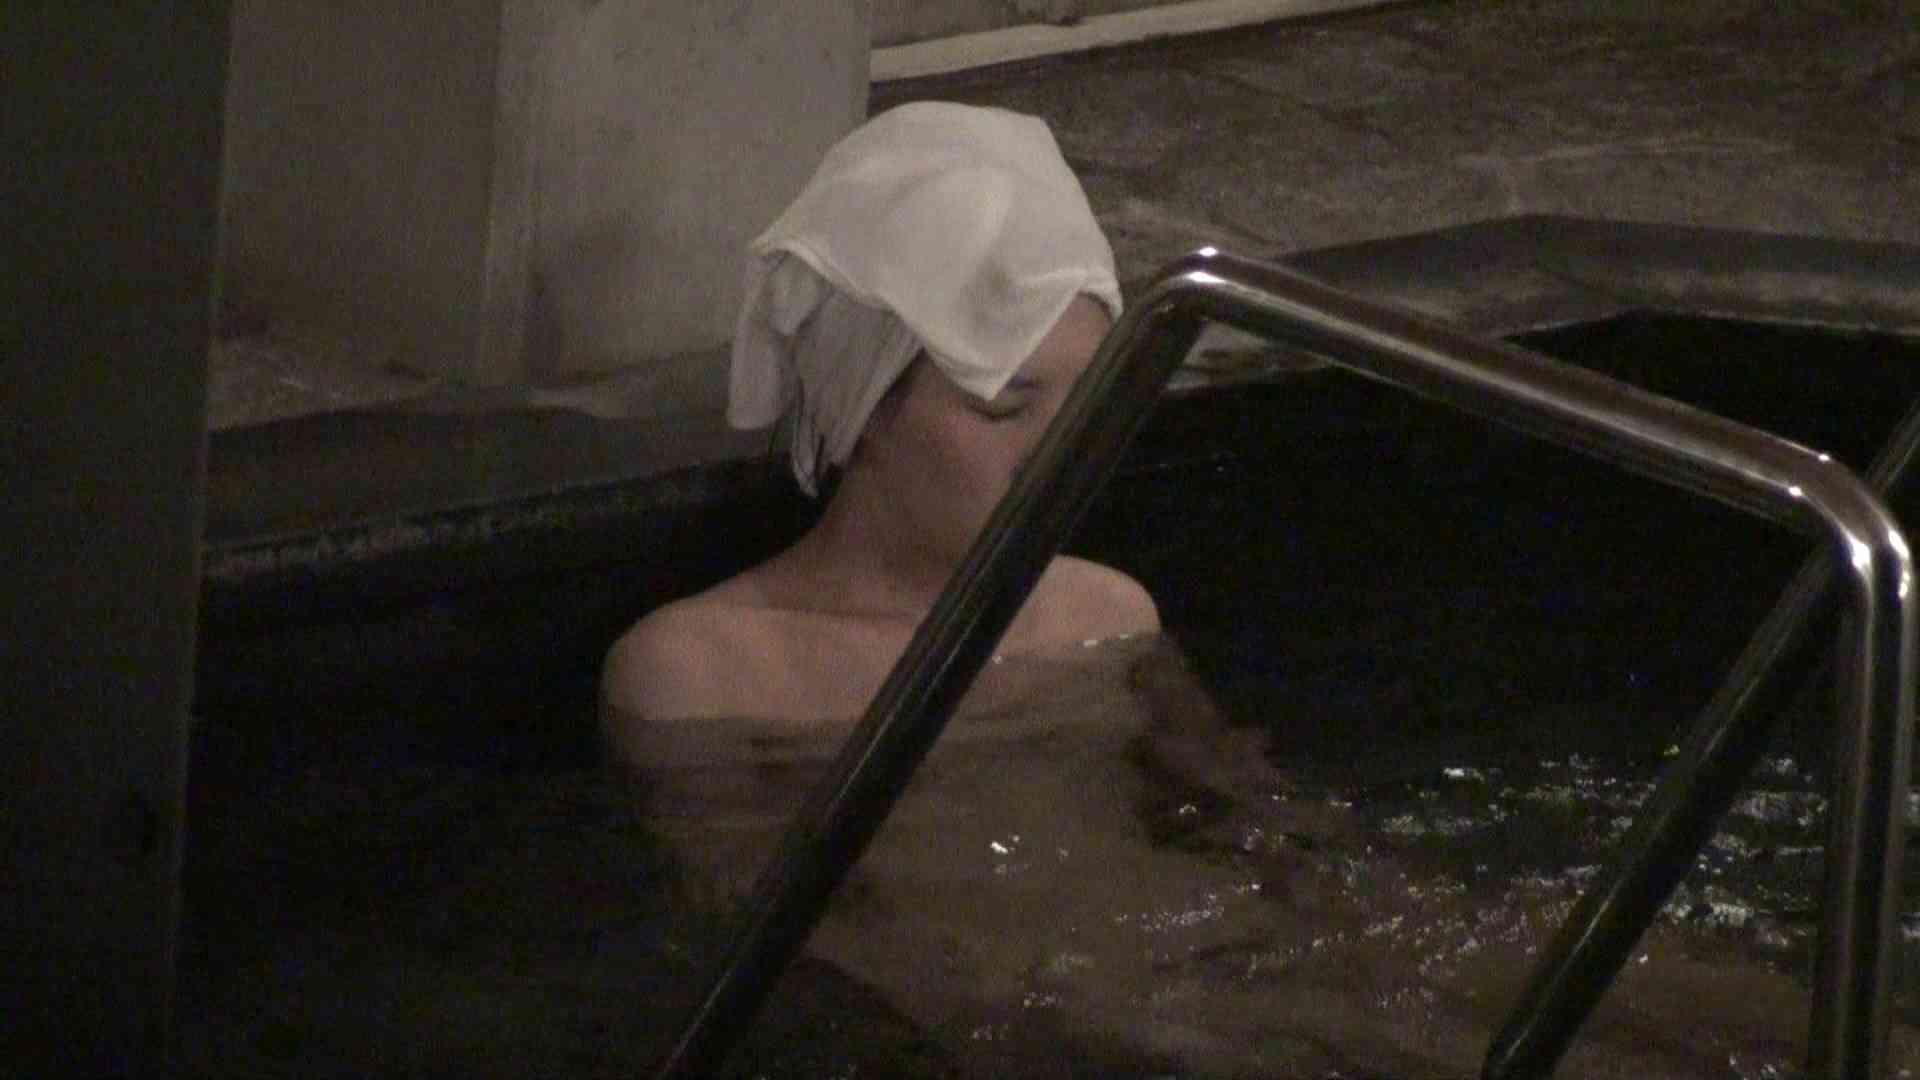 Aquaな露天風呂Vol.358 美しいOLの裸体 | 露天風呂突入  80pic 22